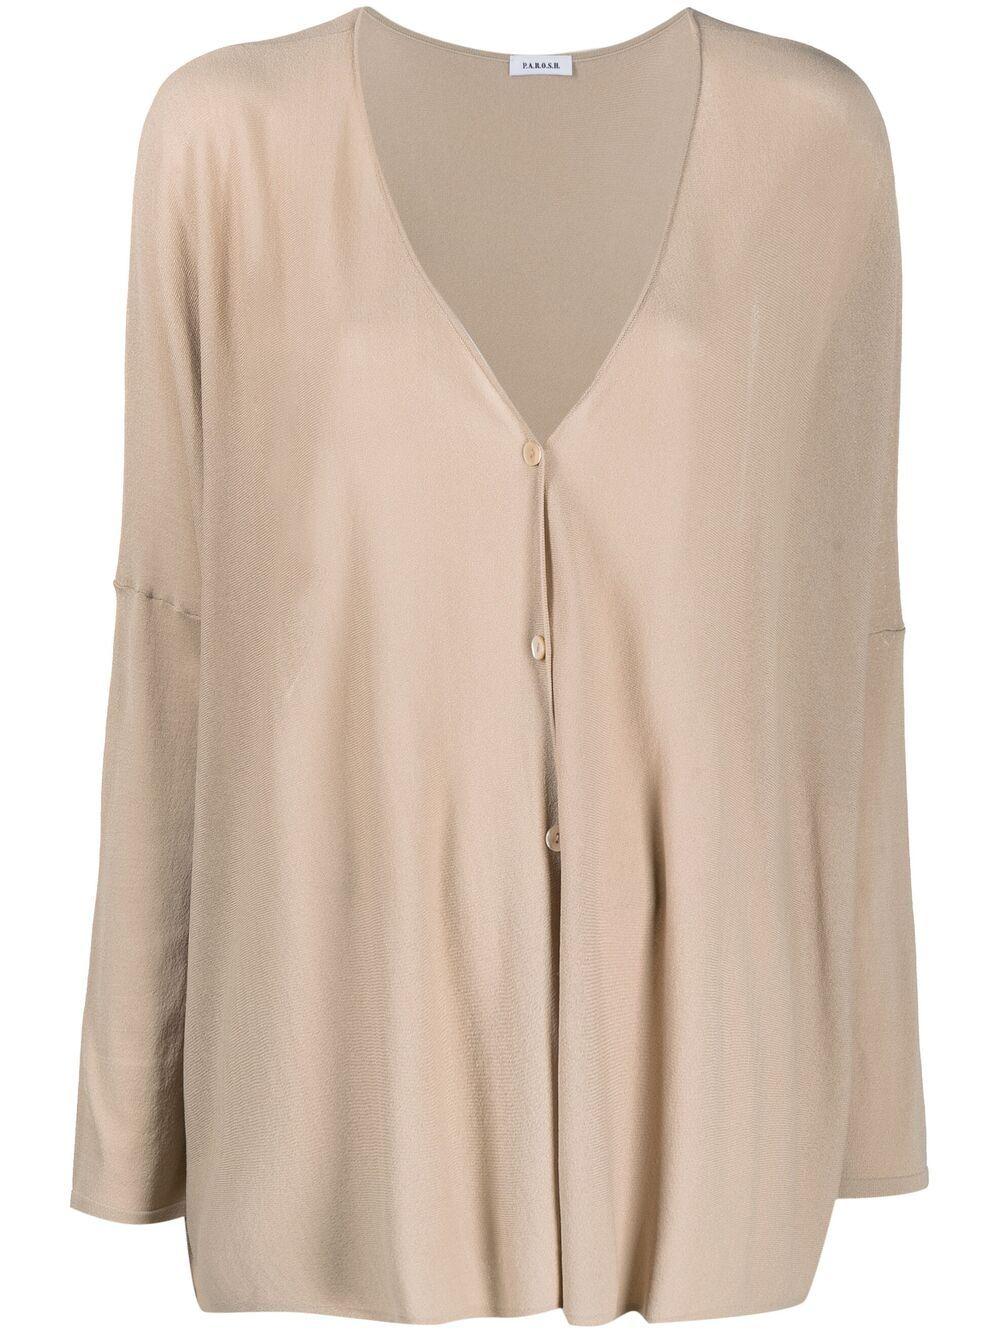 Cardigan beige in maglia con bottoni P.A.R.O.S.H. | Cardigan | D520692-ROIBOS004